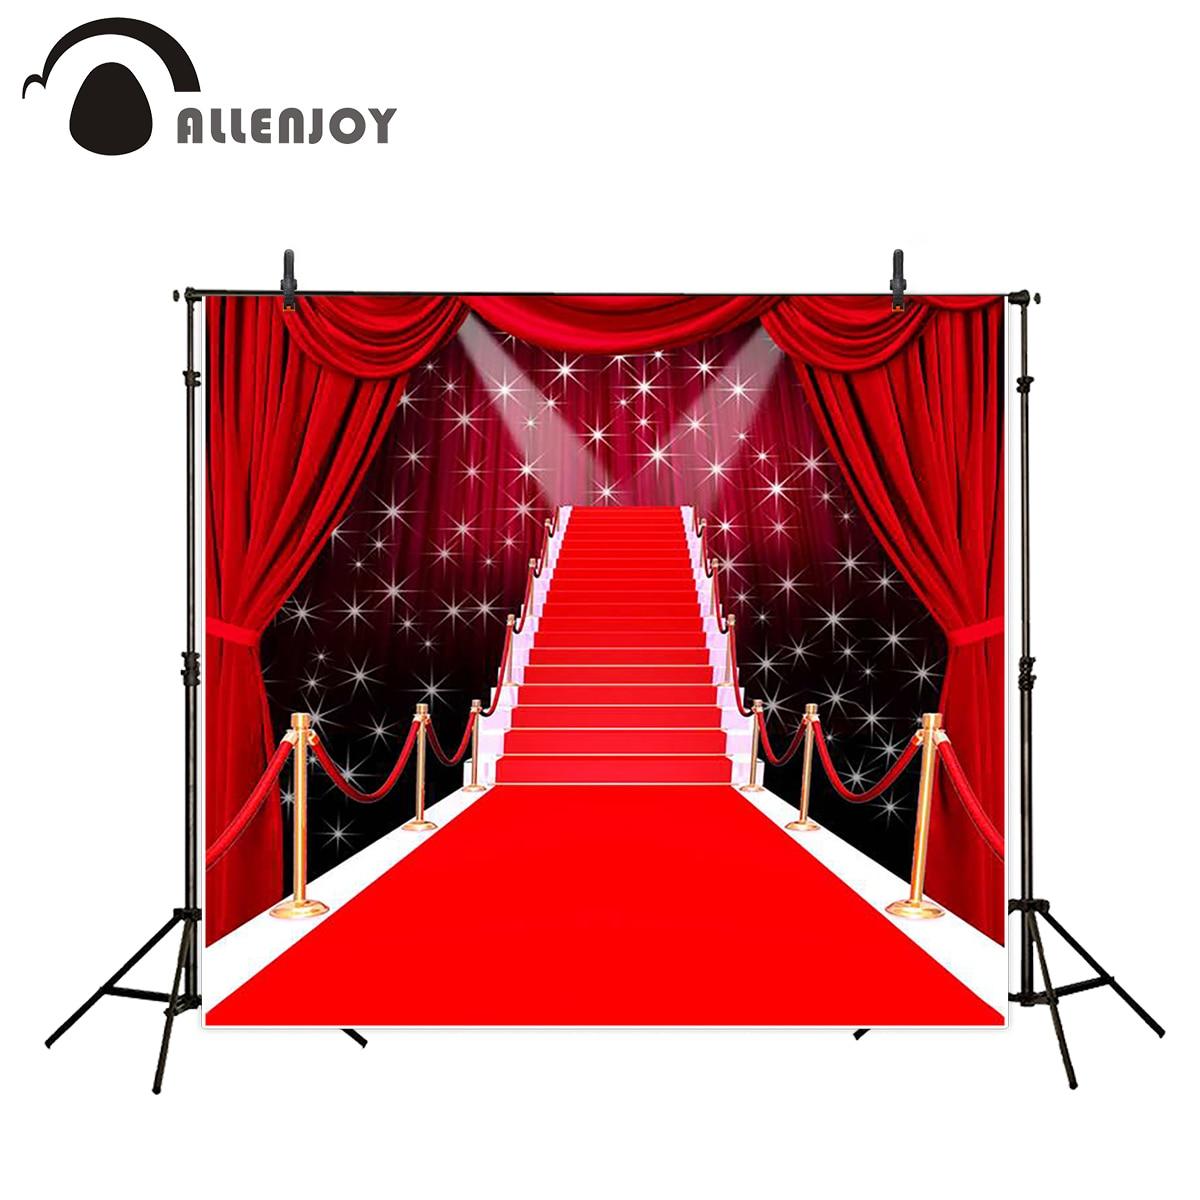 Allenjoy background photography long red carpet glitter wedding backdrops photocall fantasy props photobooth photo studio allenjoy photographic background pink stage halo glitter backdrops photobooth fantasy props cloth fabric photo studio